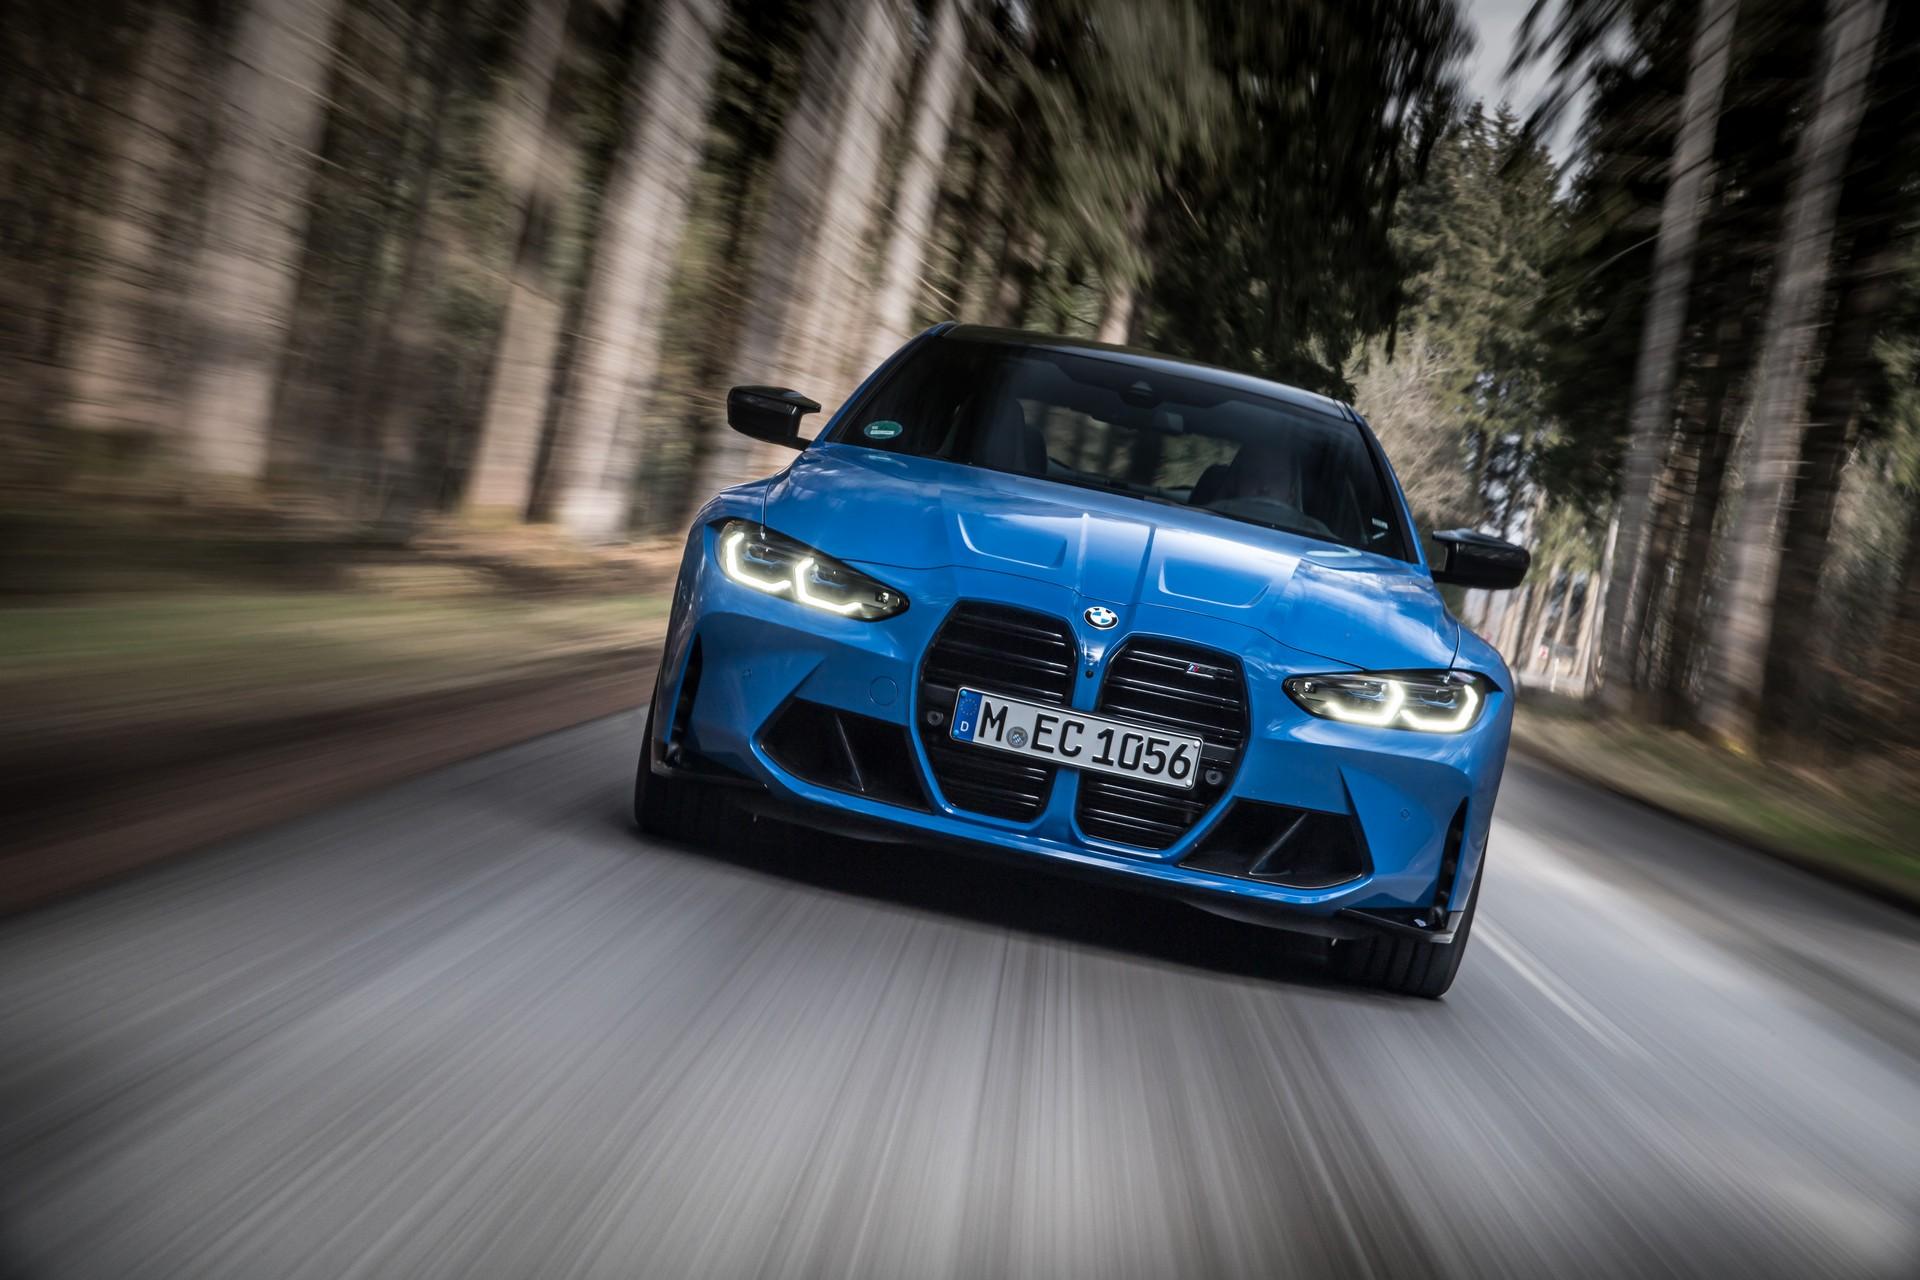 BMW-M3-M4-Competition-xDrive-13.jpg